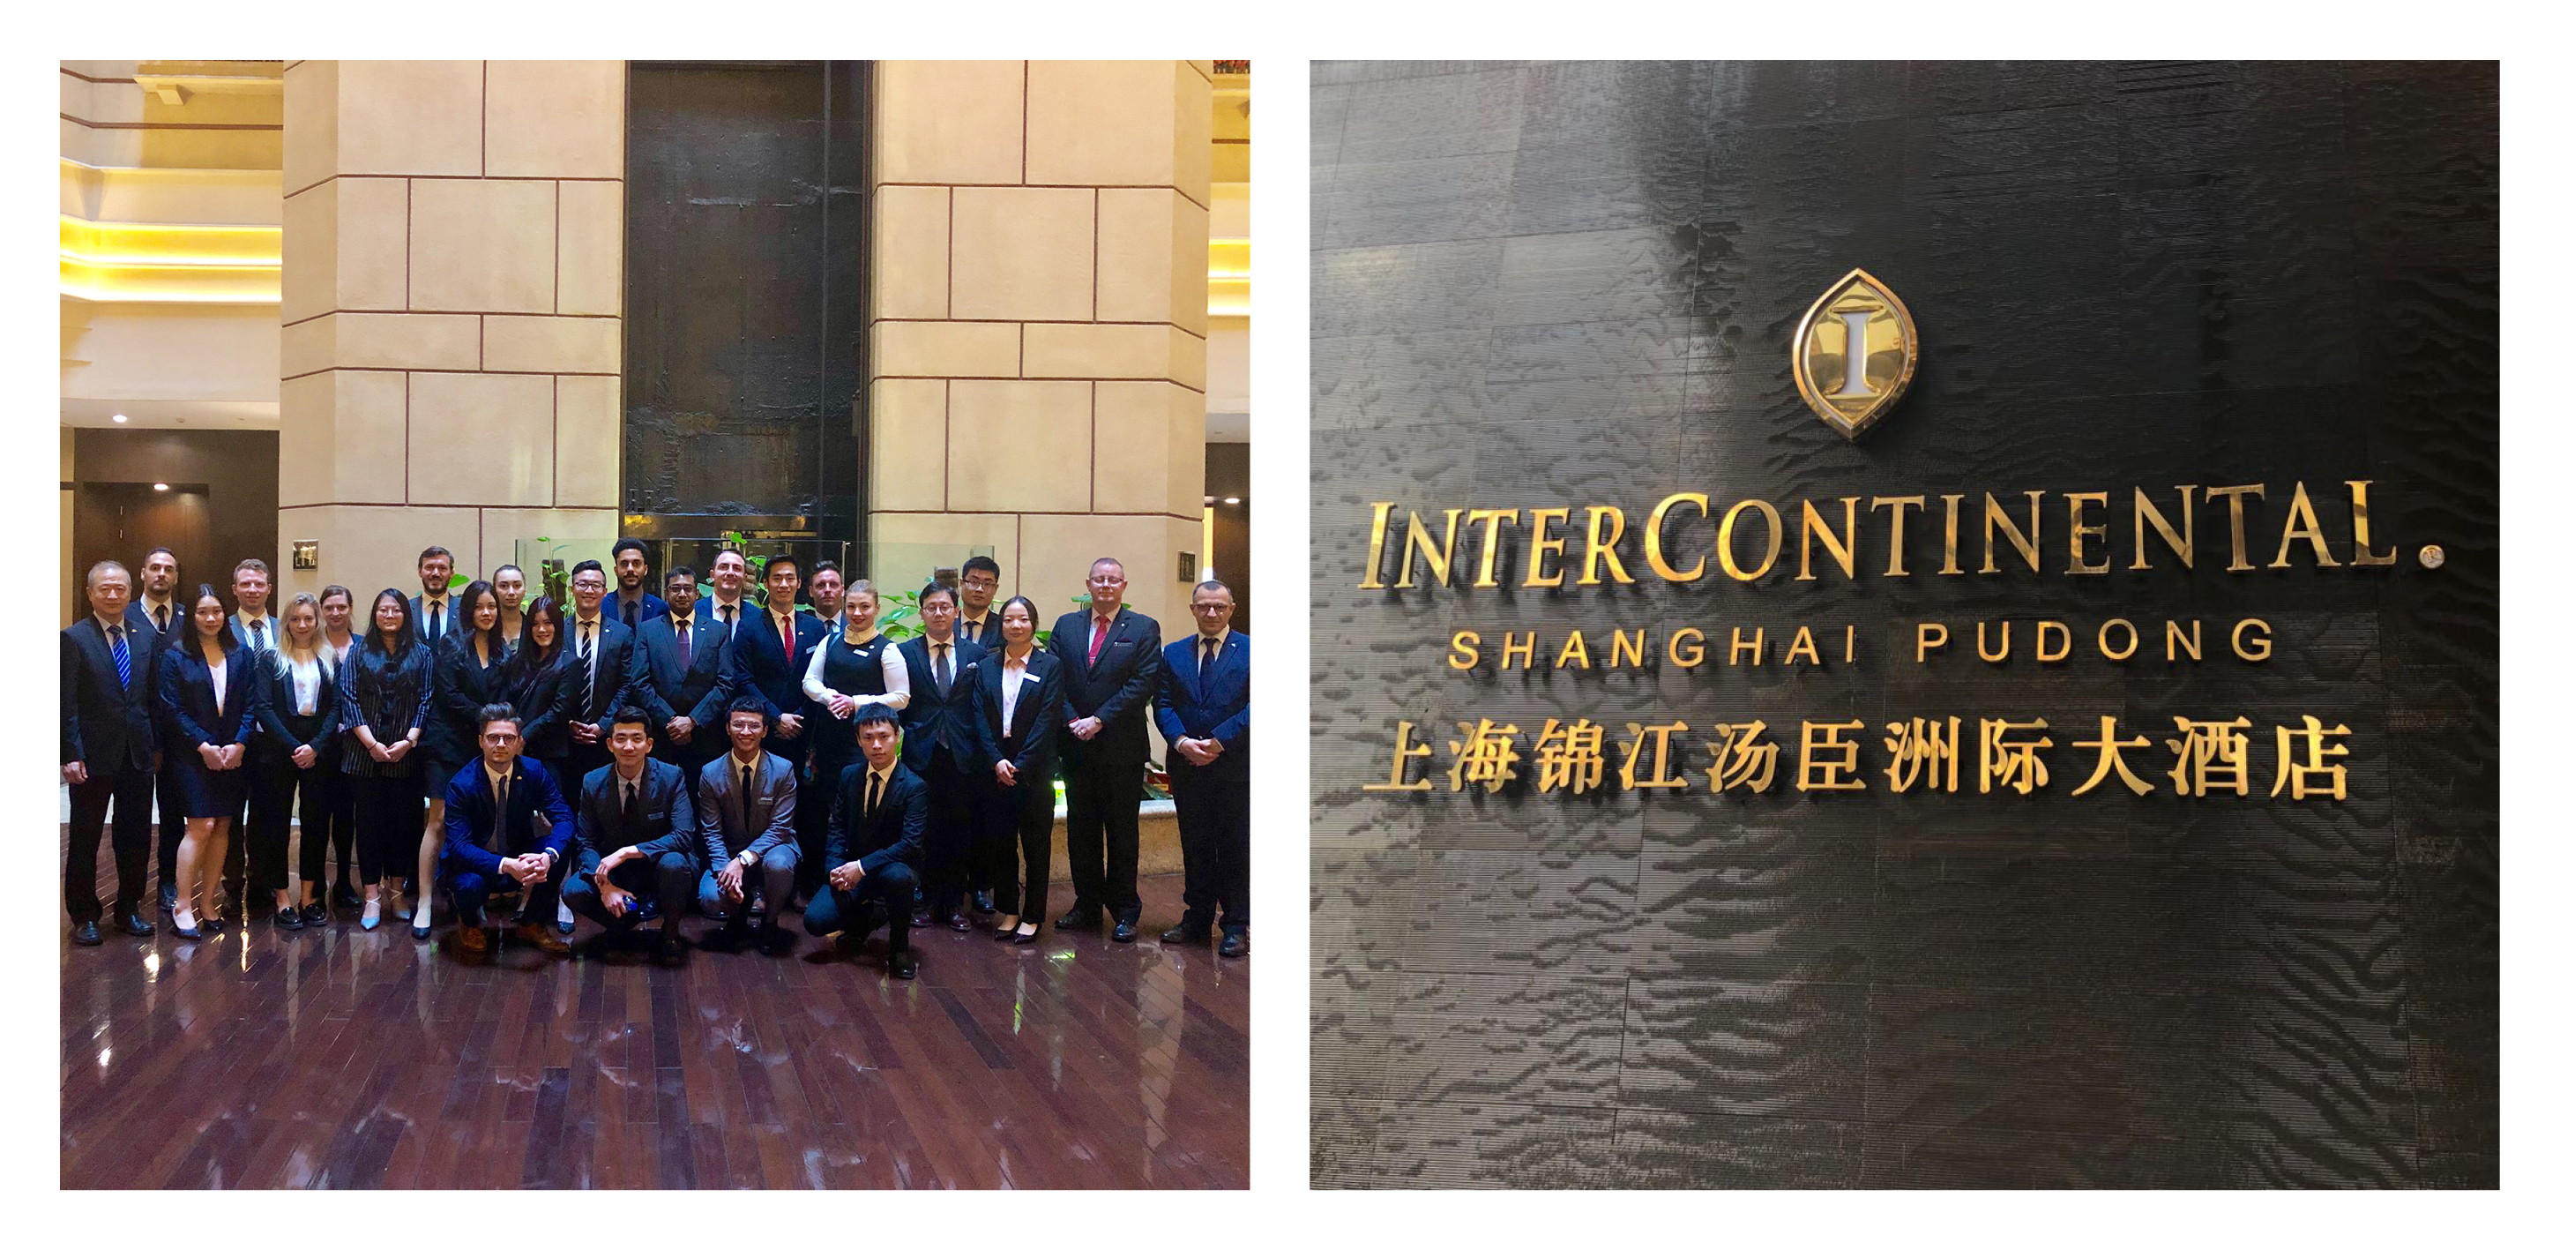 BL041_MBA_ShanghaiTrip_InterContinental